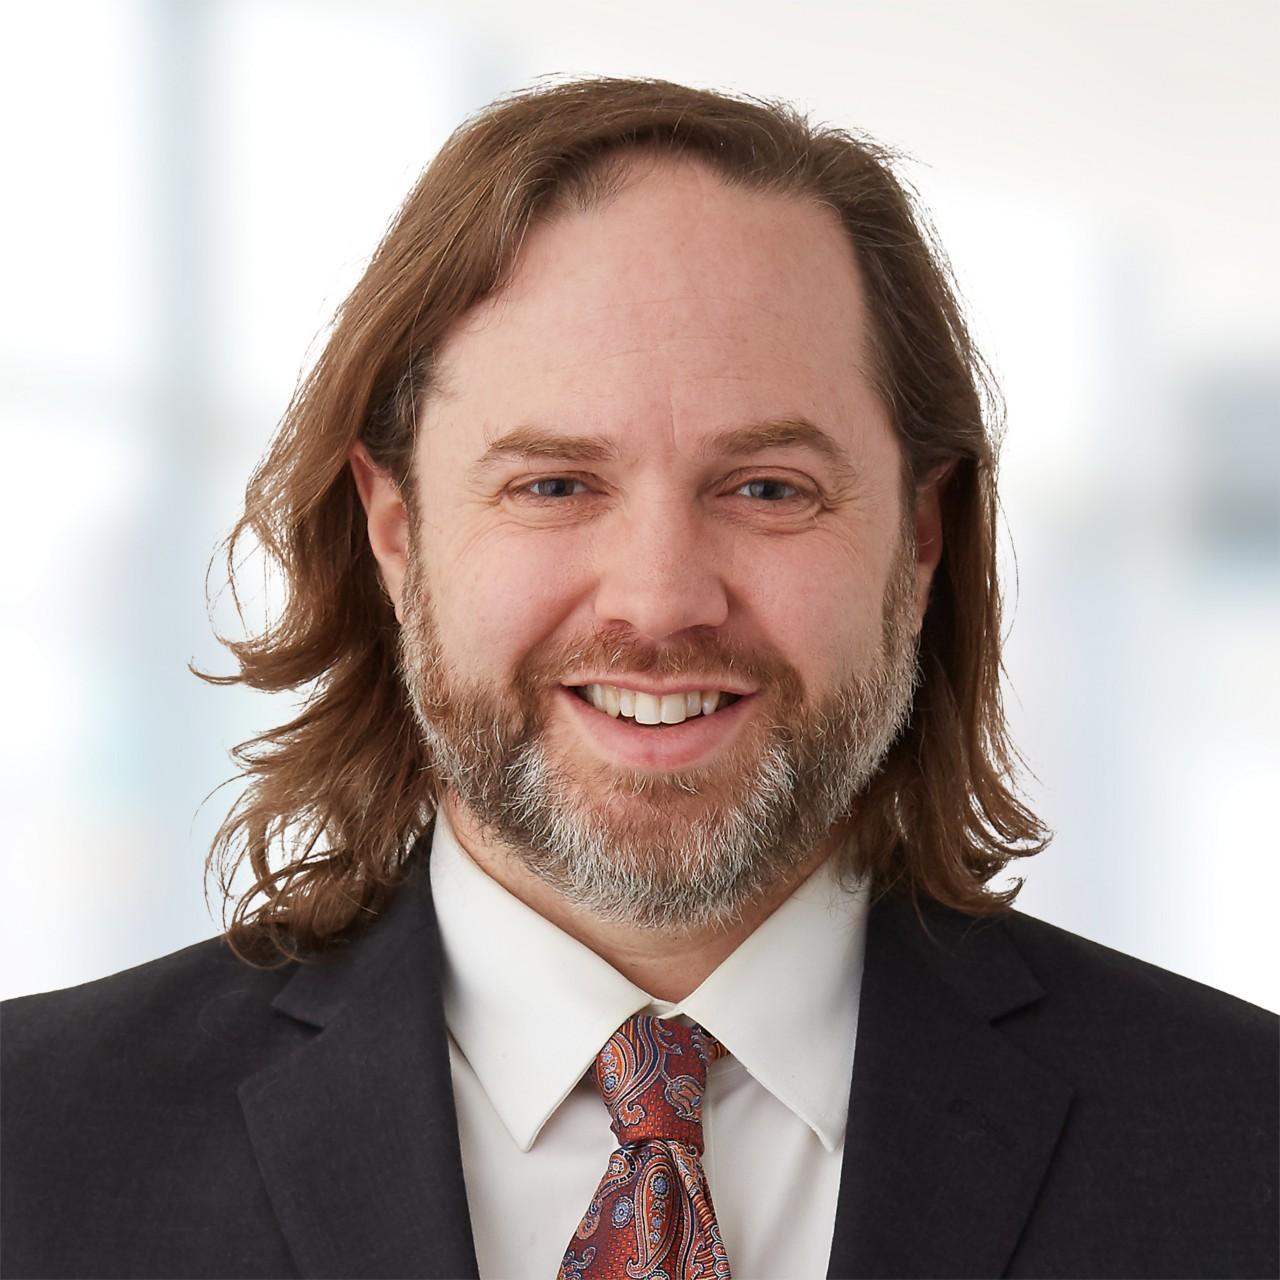 Marcus Westerman, MD, PhD